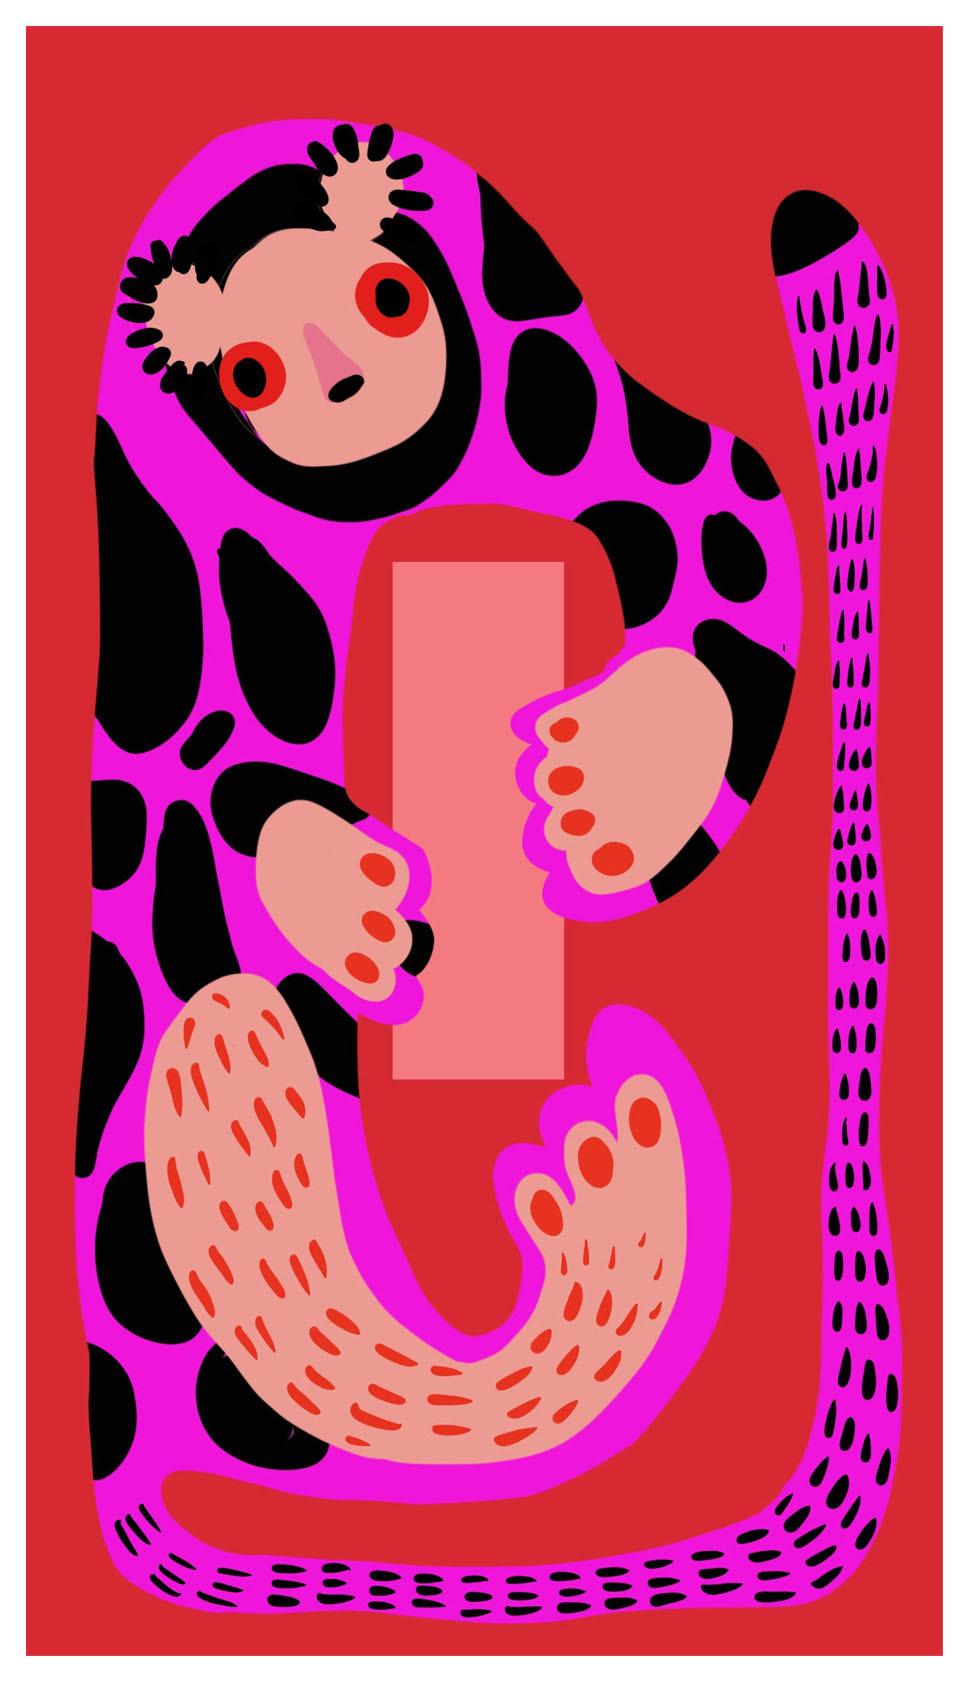 illustrasyon_02Artboard 1 copy 8.jpg